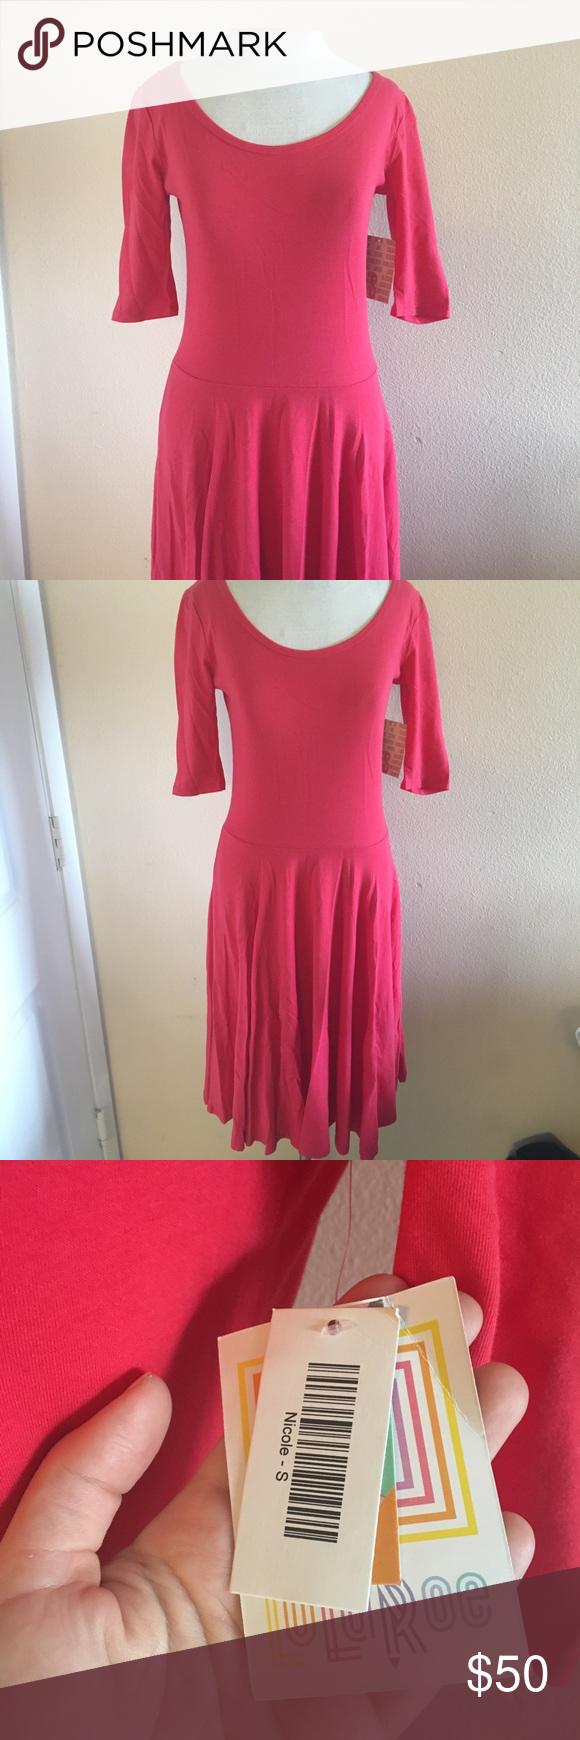 Lularoe nicole dress pinkred nicole dress new with tags questions